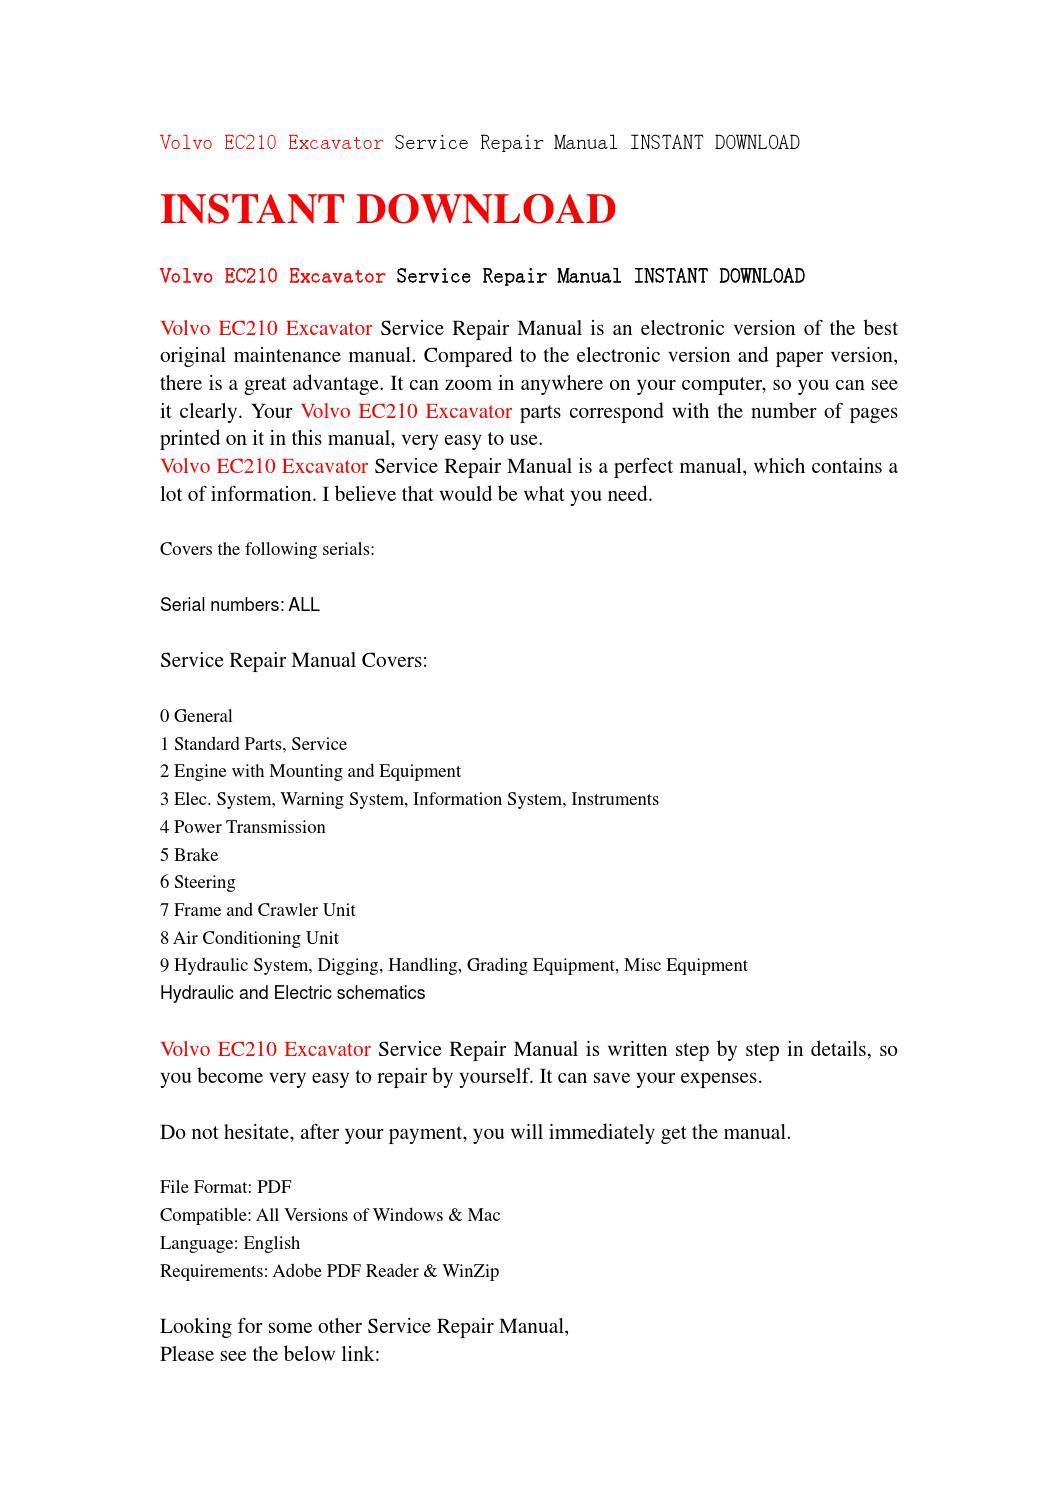 volvo ec210 excavator service repair manual instant download by rh issuu com